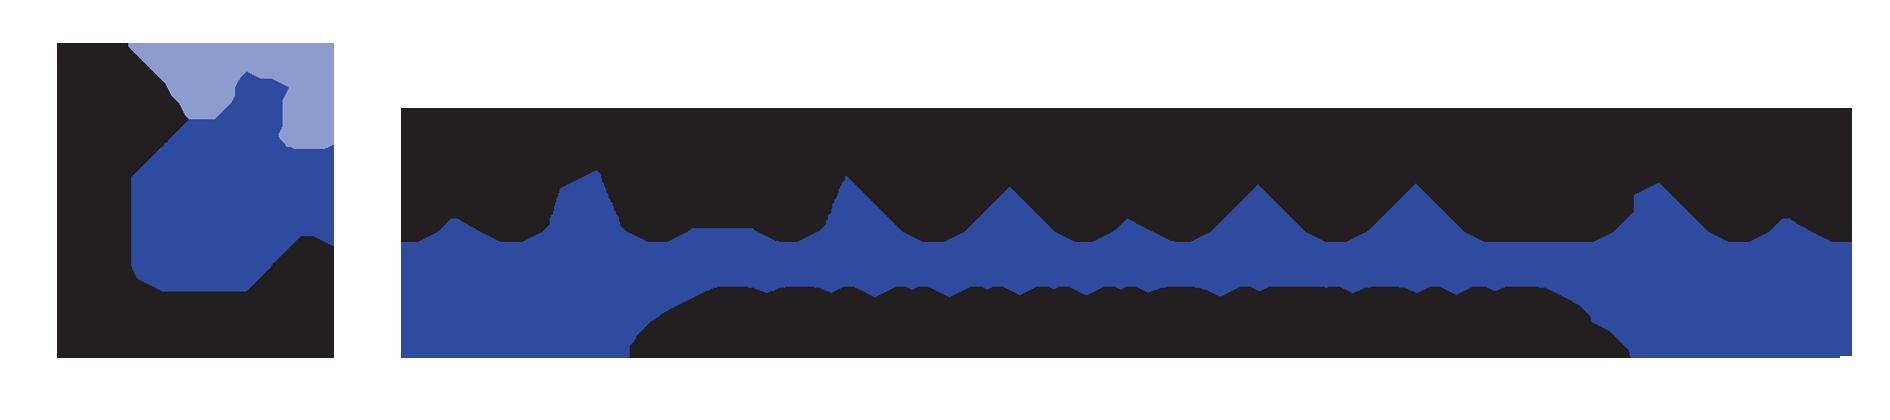 Rainier Communications   Technology Public Relations